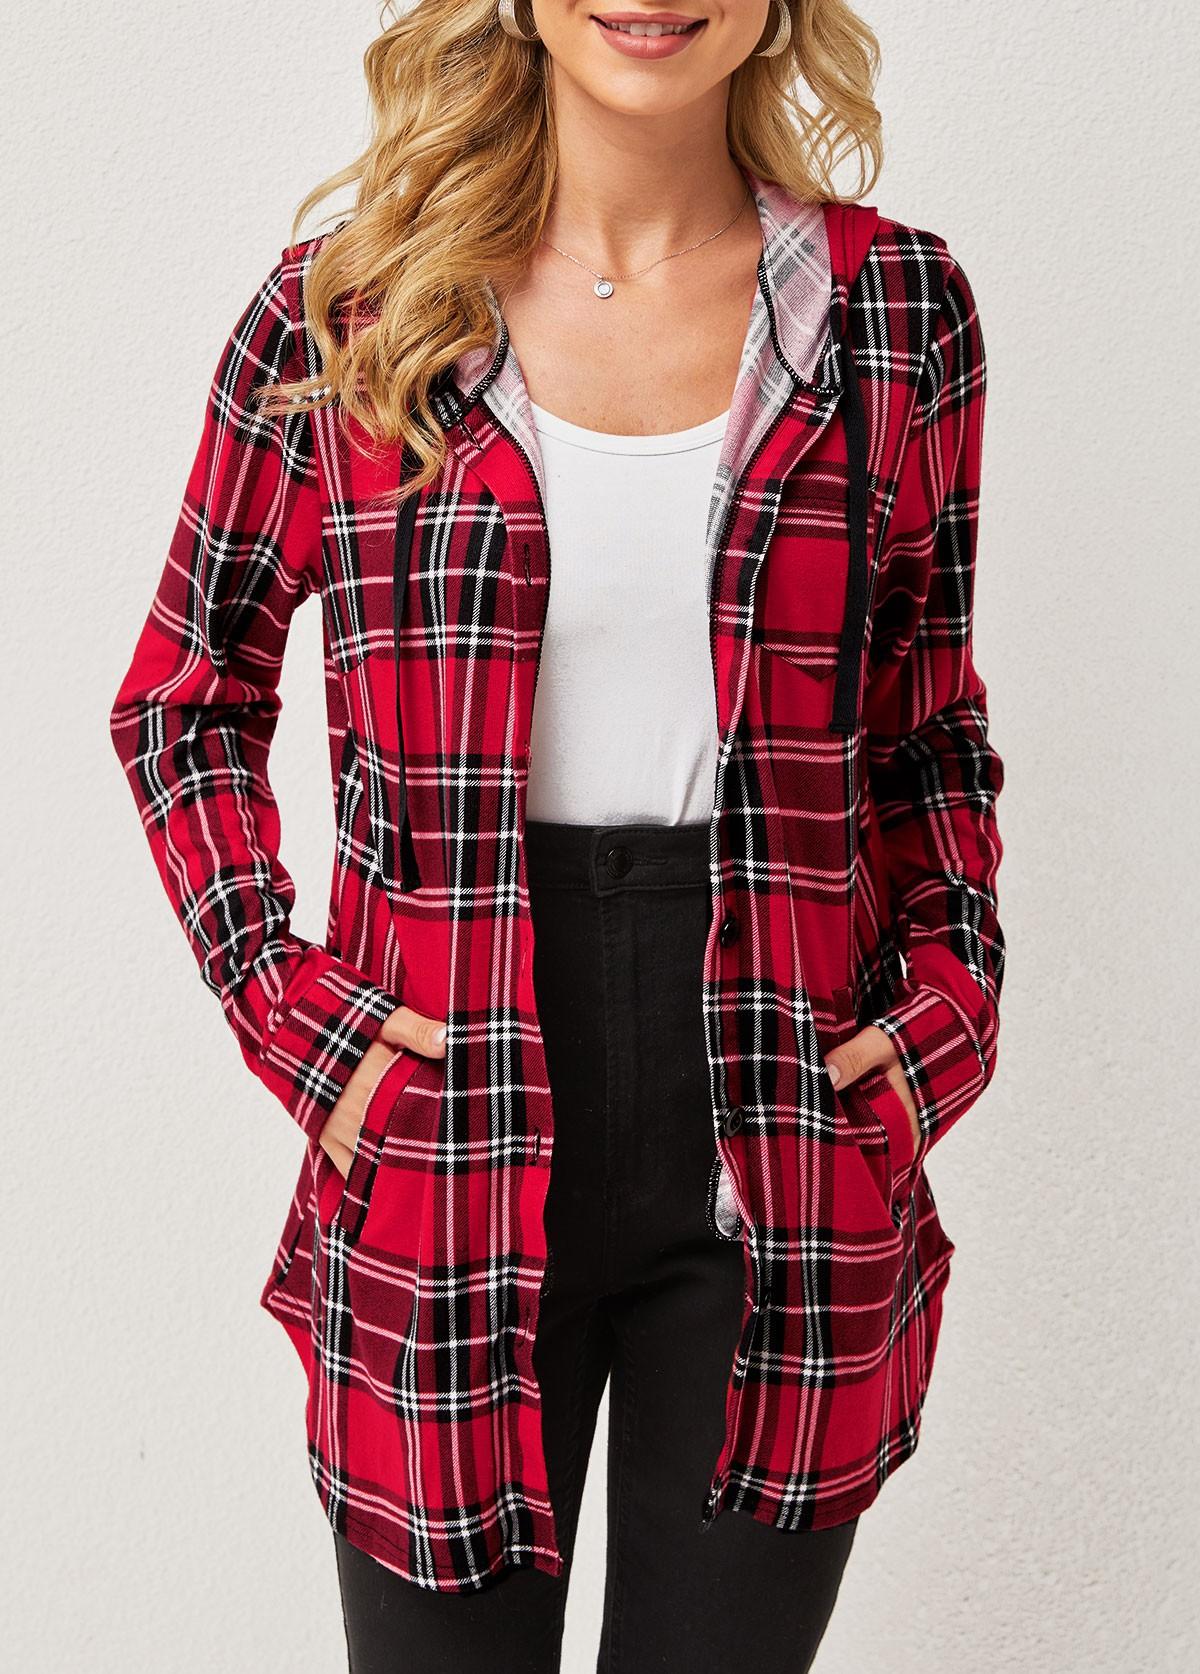 ROTITA Plaid Double Side Pockets Hooded Collar Long Sleeve Blouse